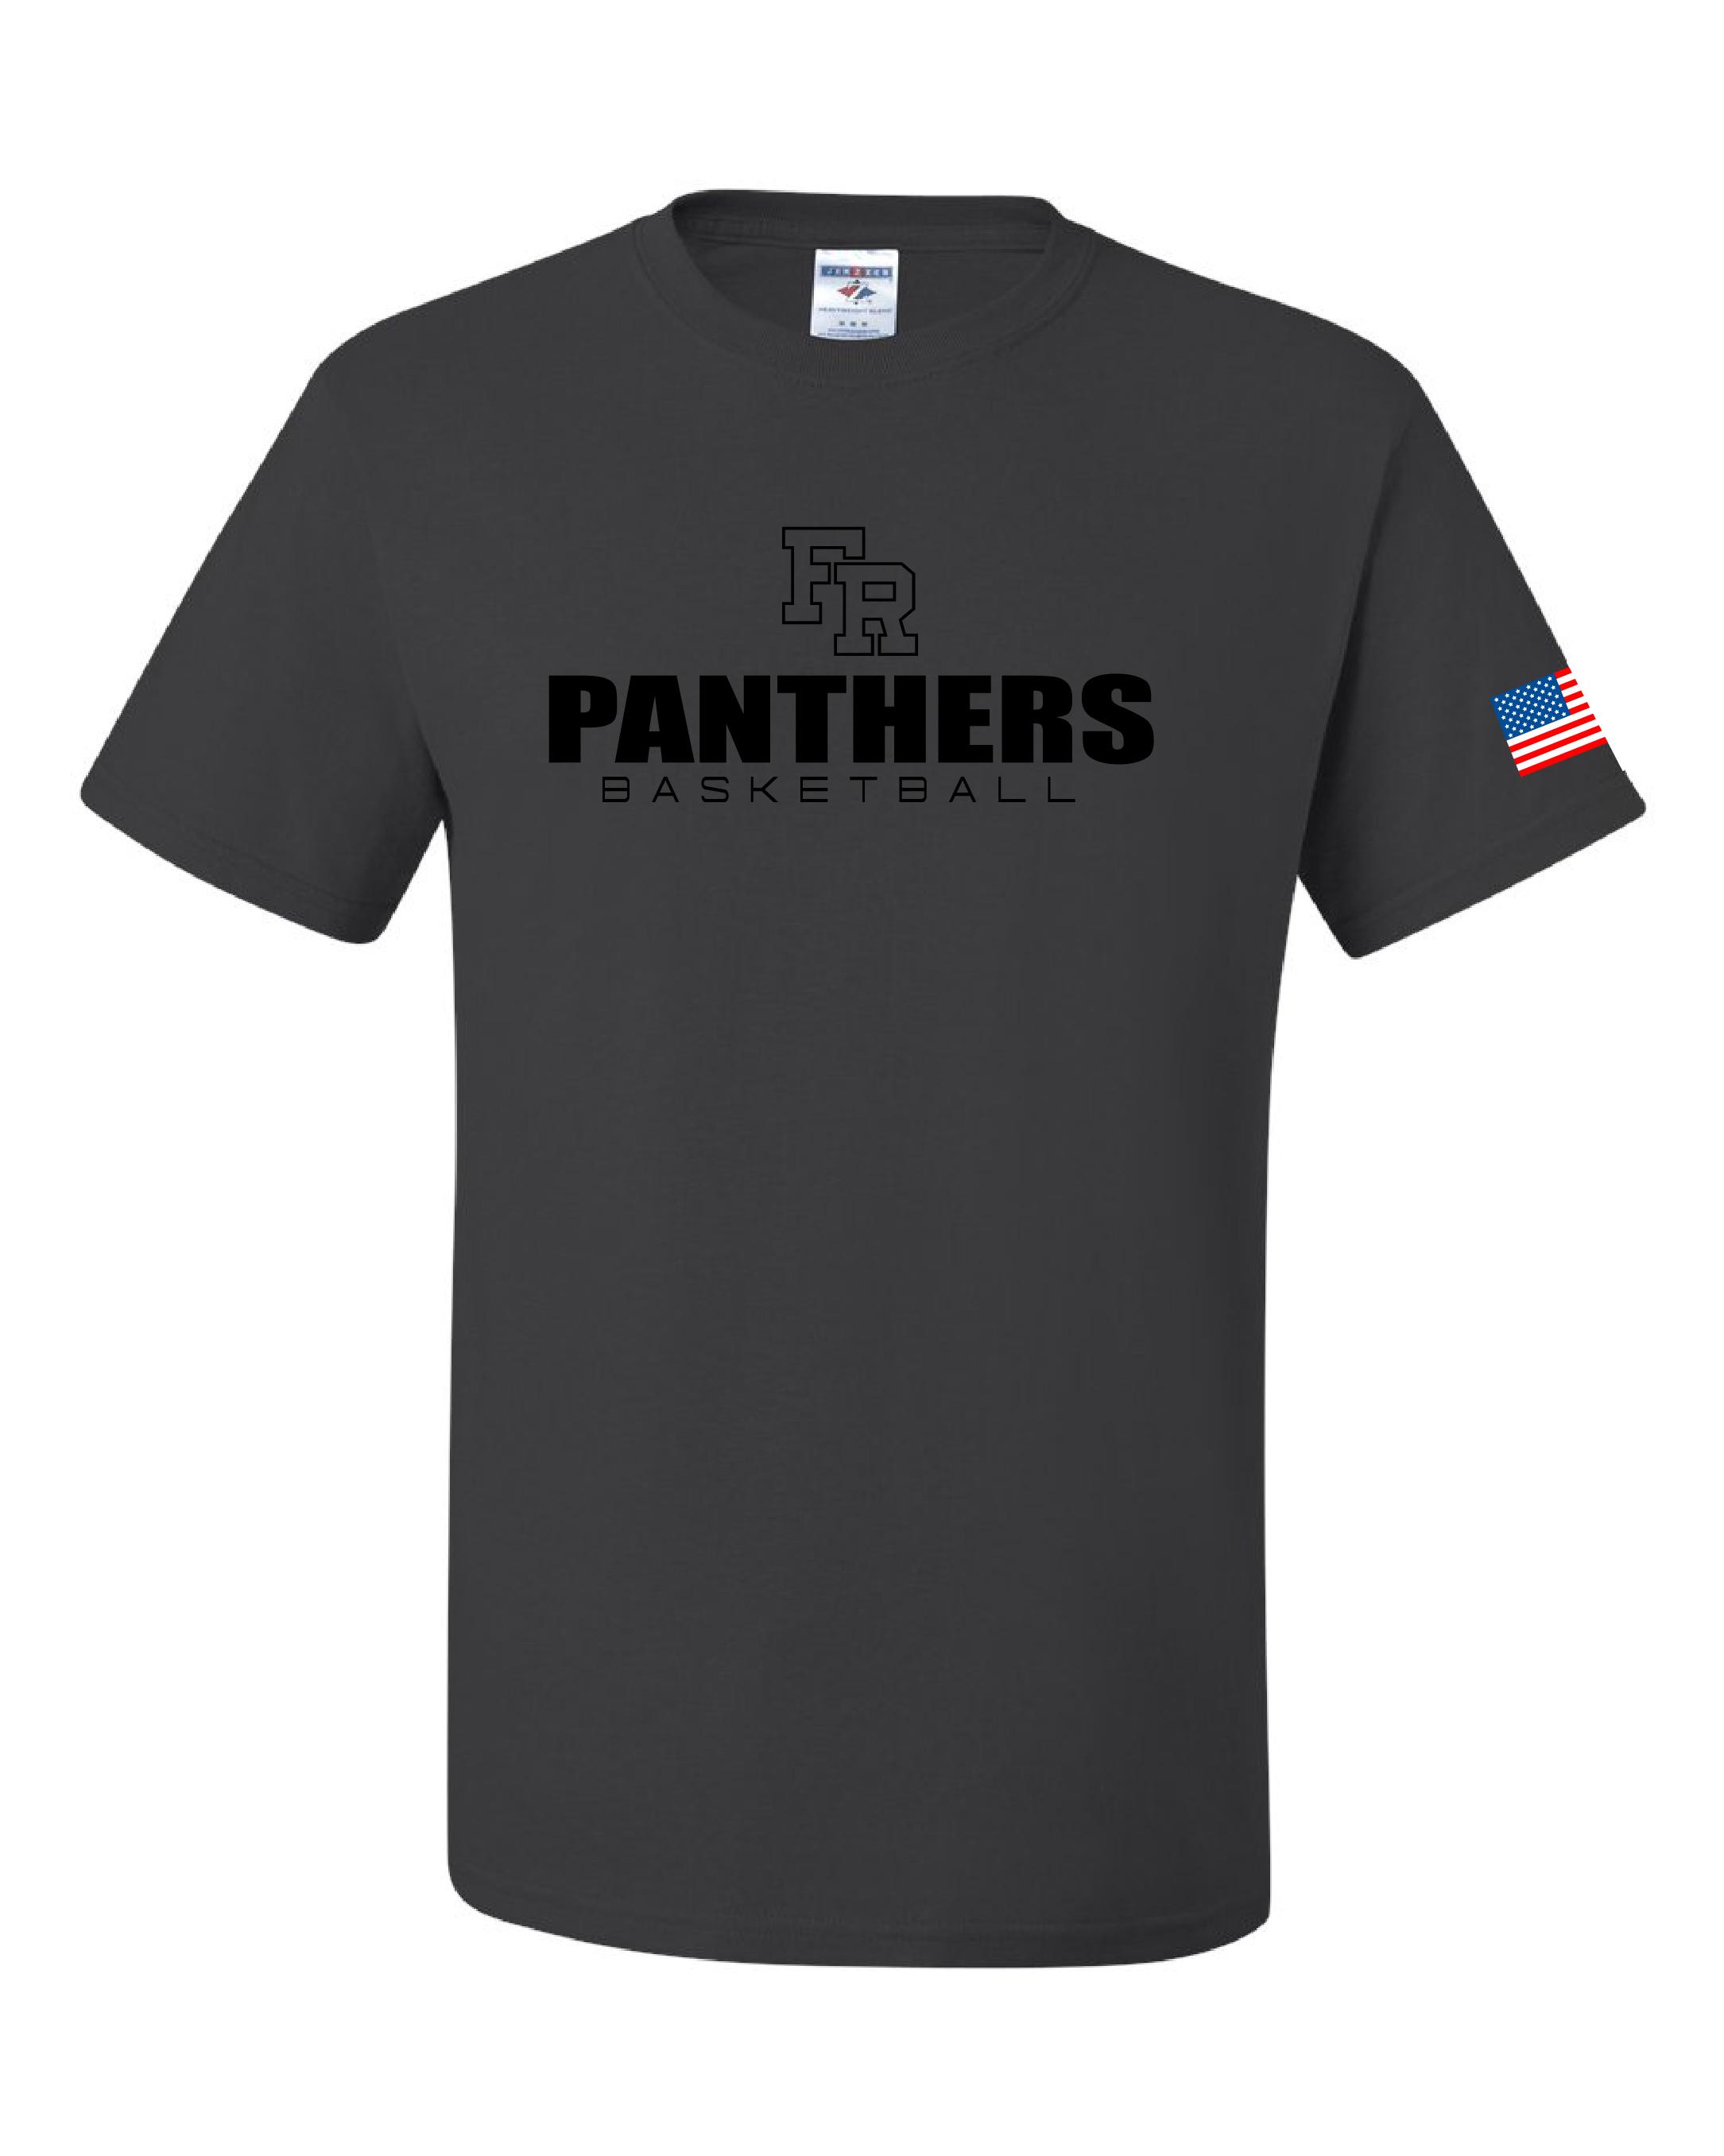 Gildan - DryBlend 50/50 T-Shirt - 6th Man - With Flag